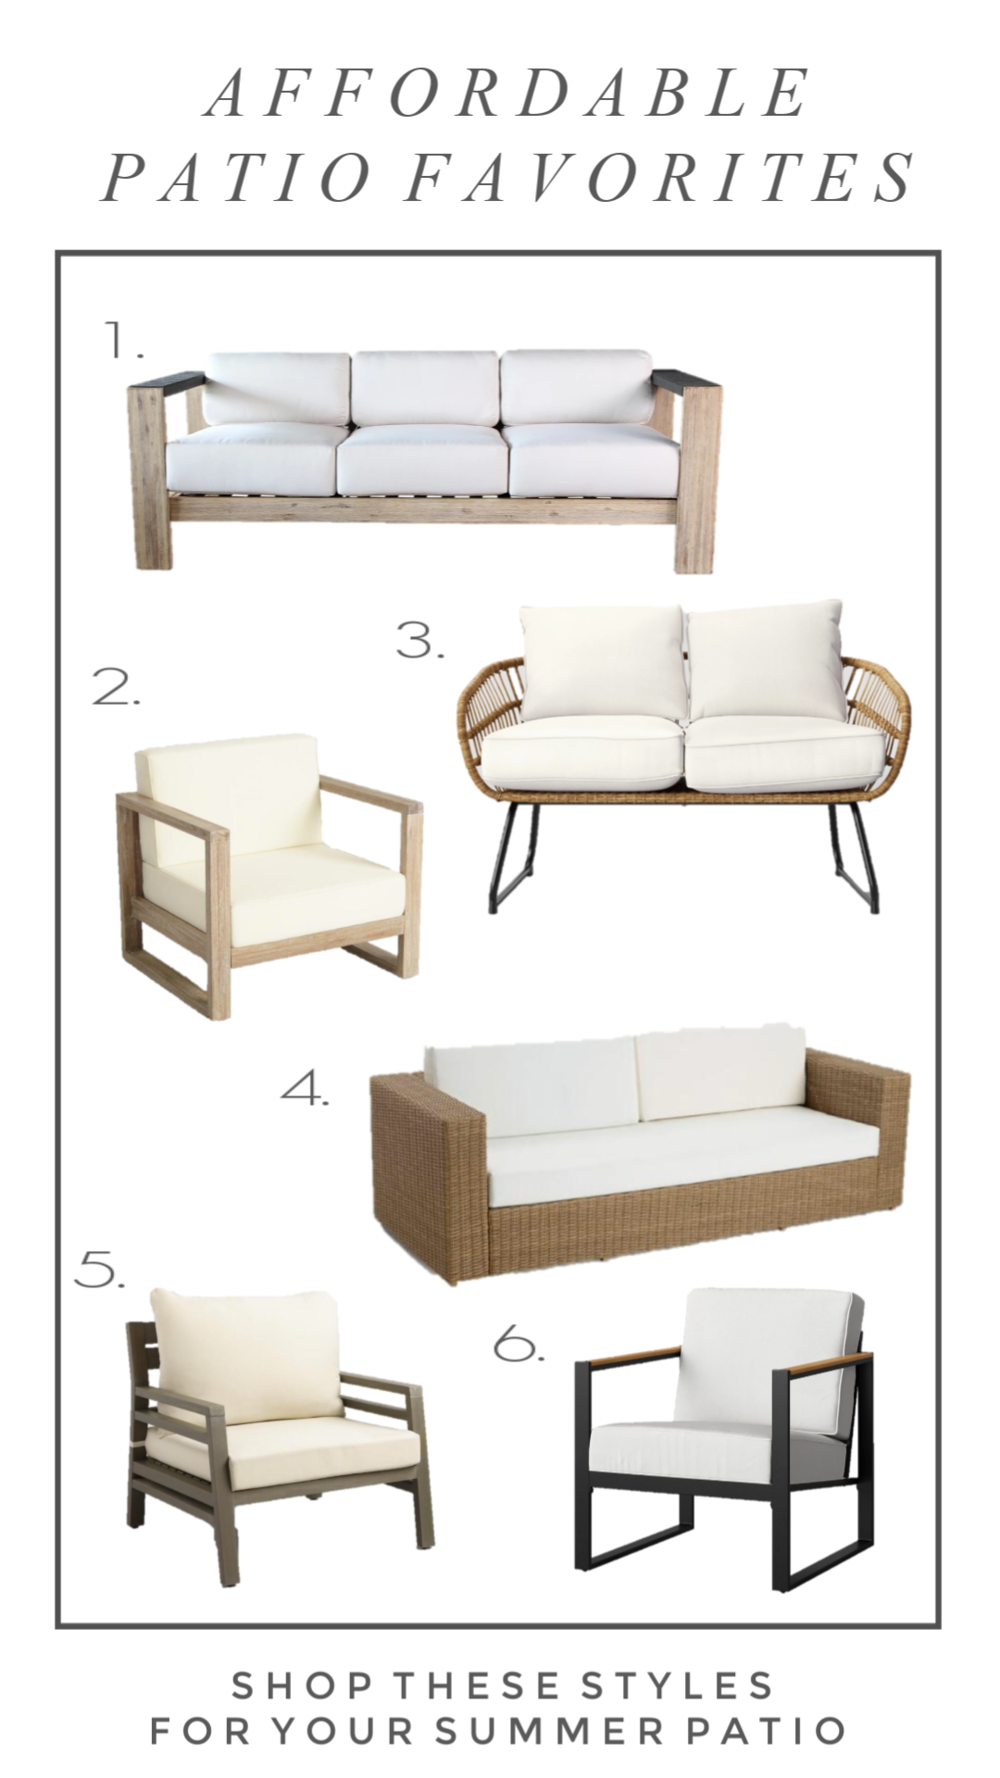 Affordable Patio Furniture Favorites.png